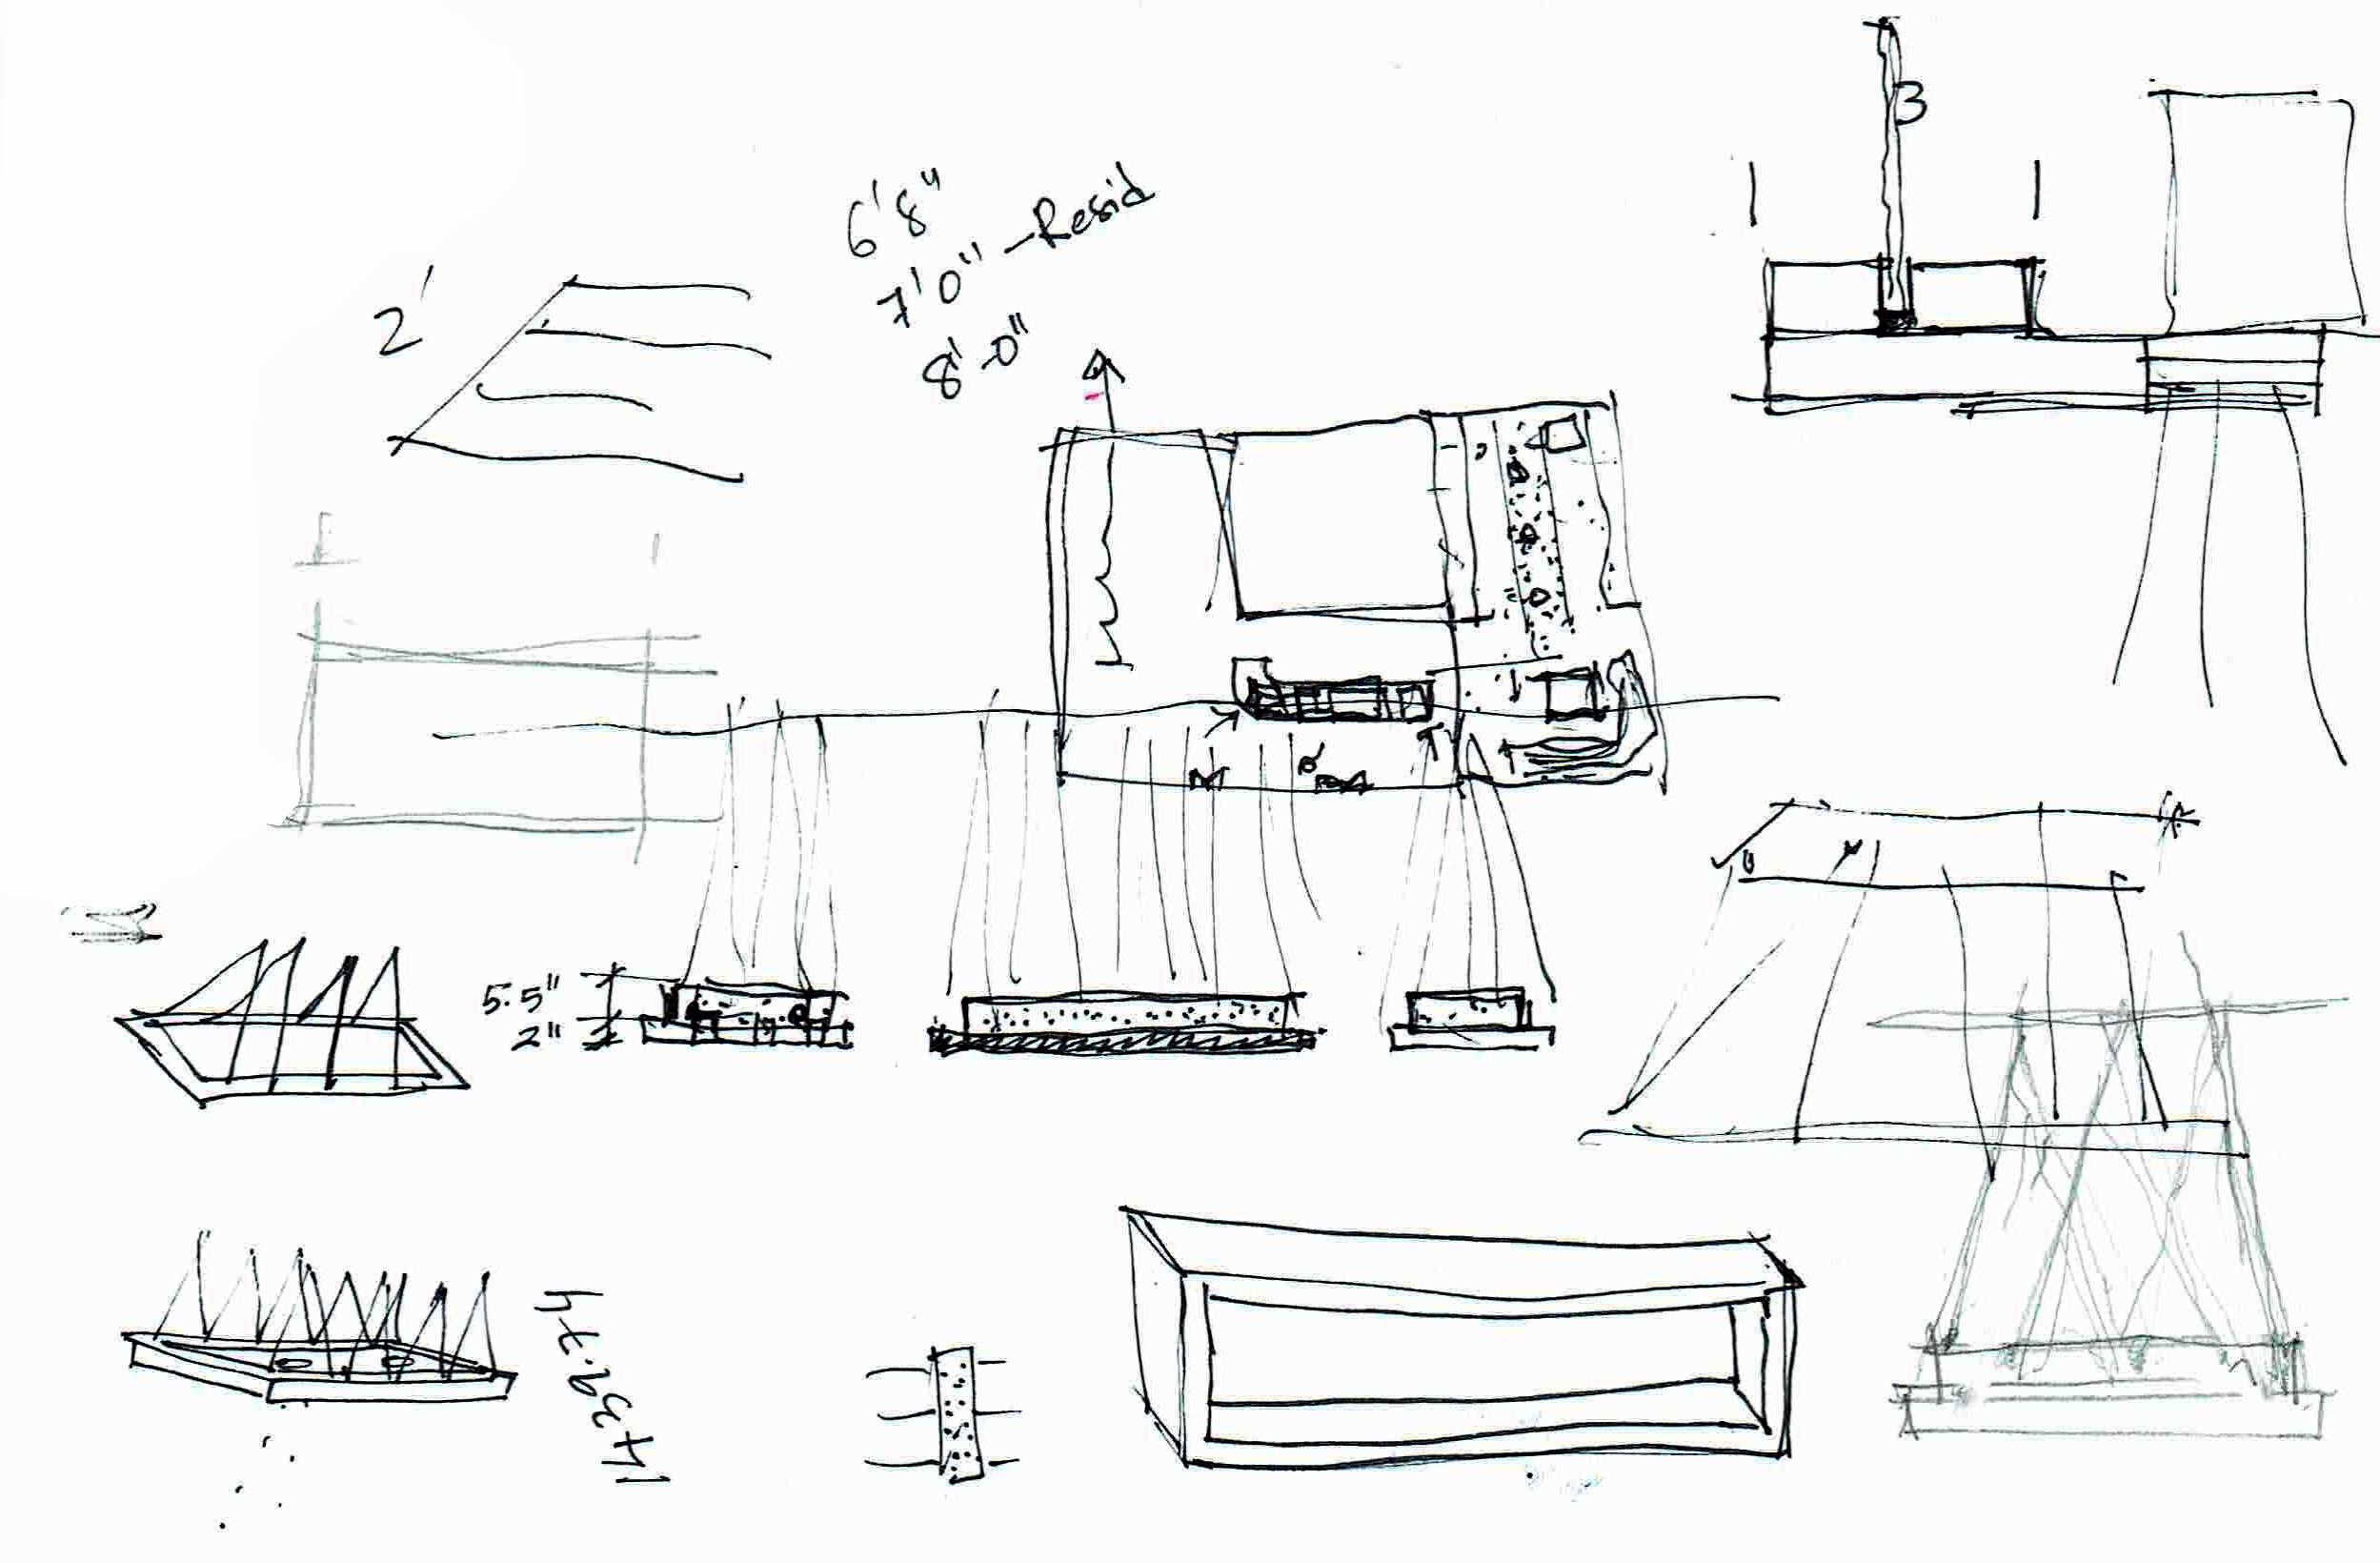 Custom Light Fixture Initial Sketches